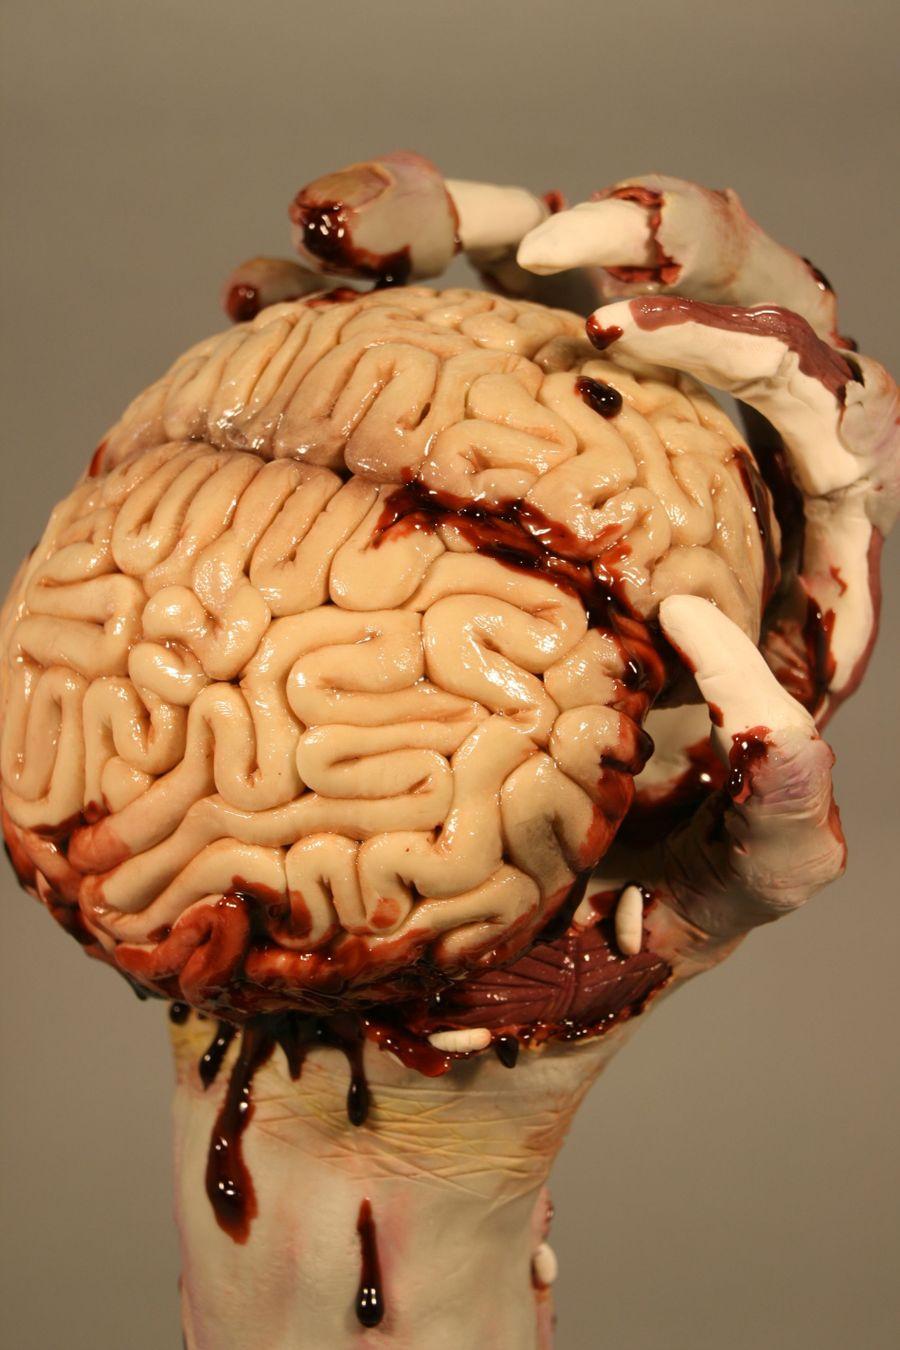 Zombie Hand Amp Brains Cakecentral Com